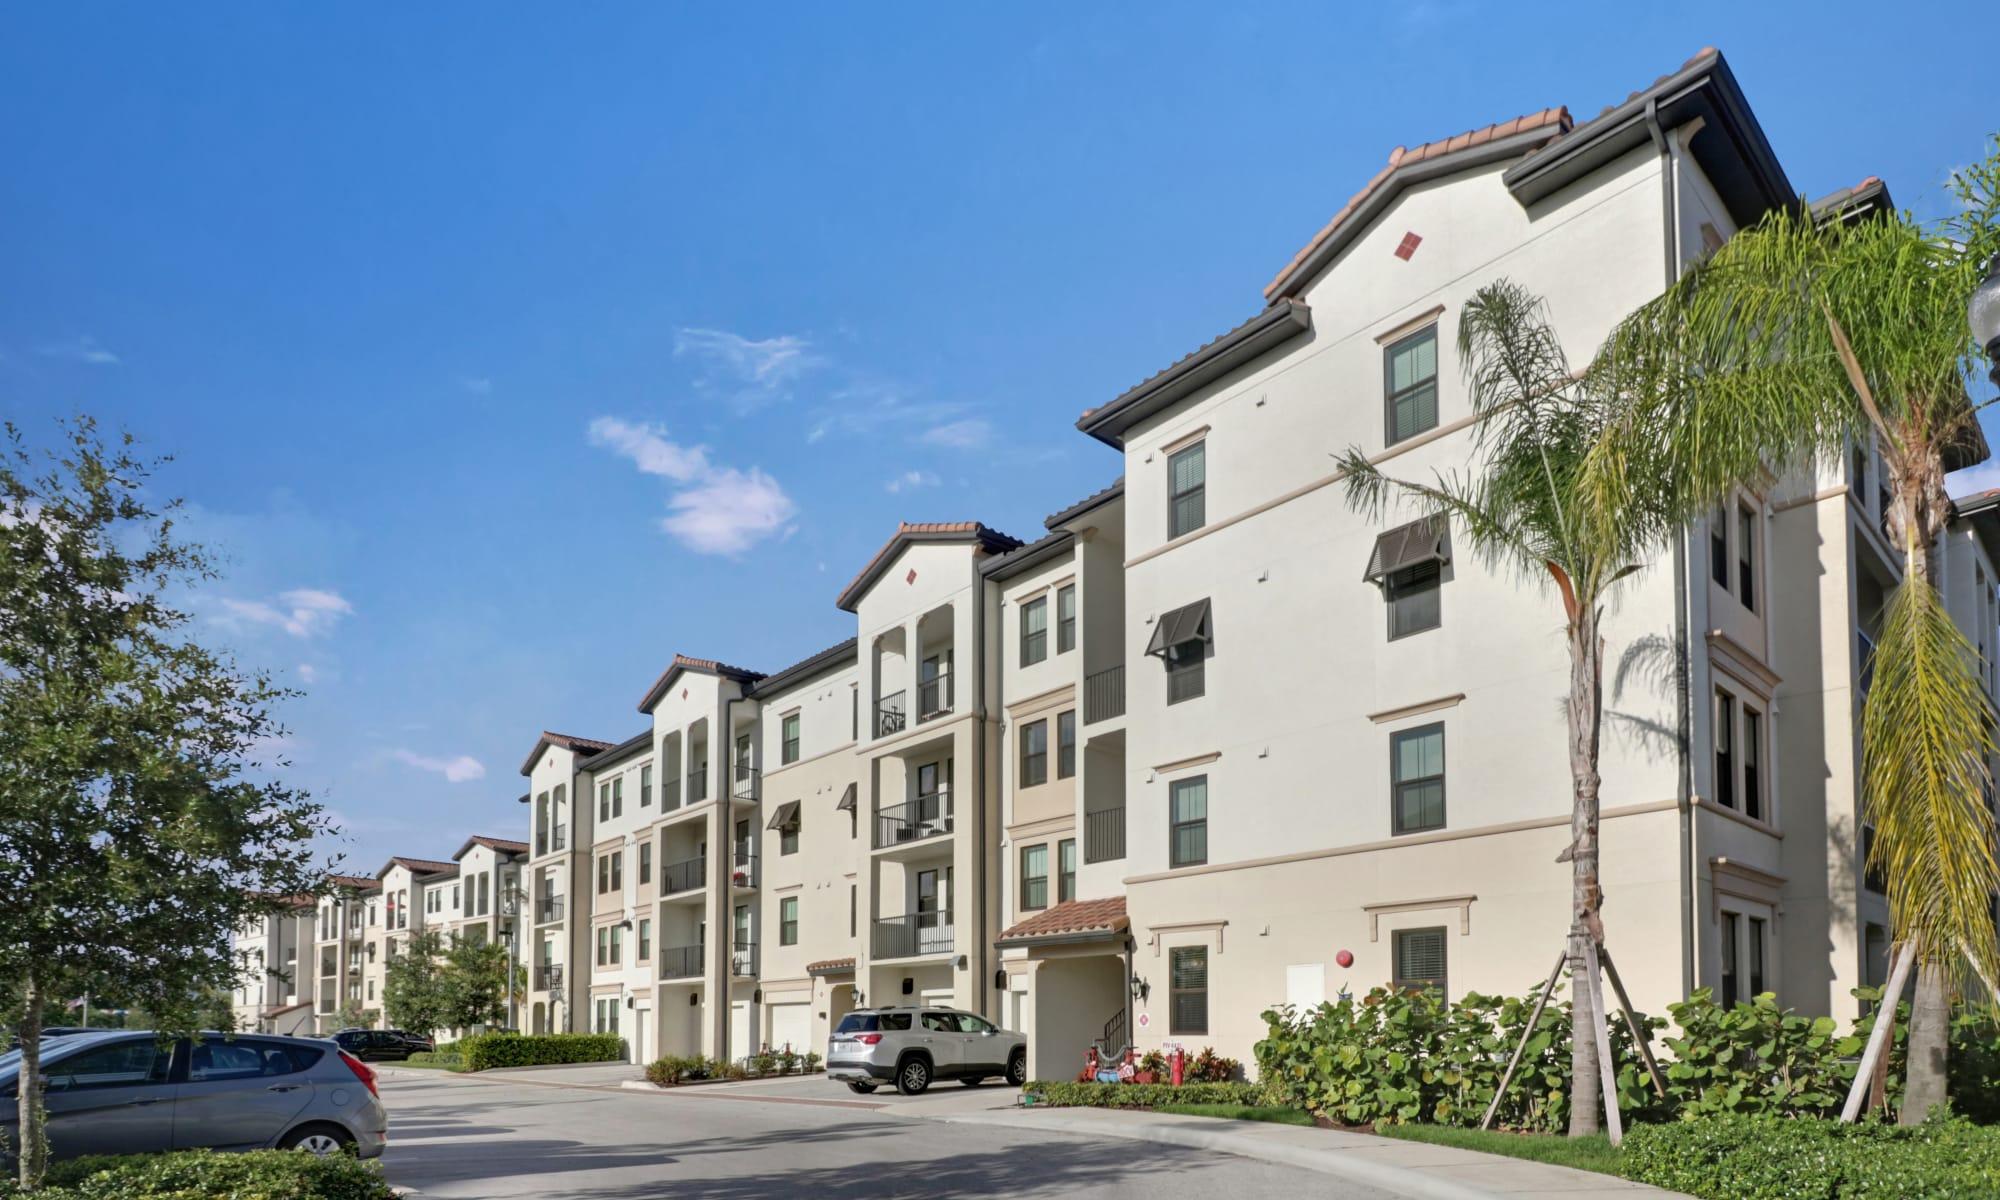 Linden Pointe apartments in Pompano Beach, Florida